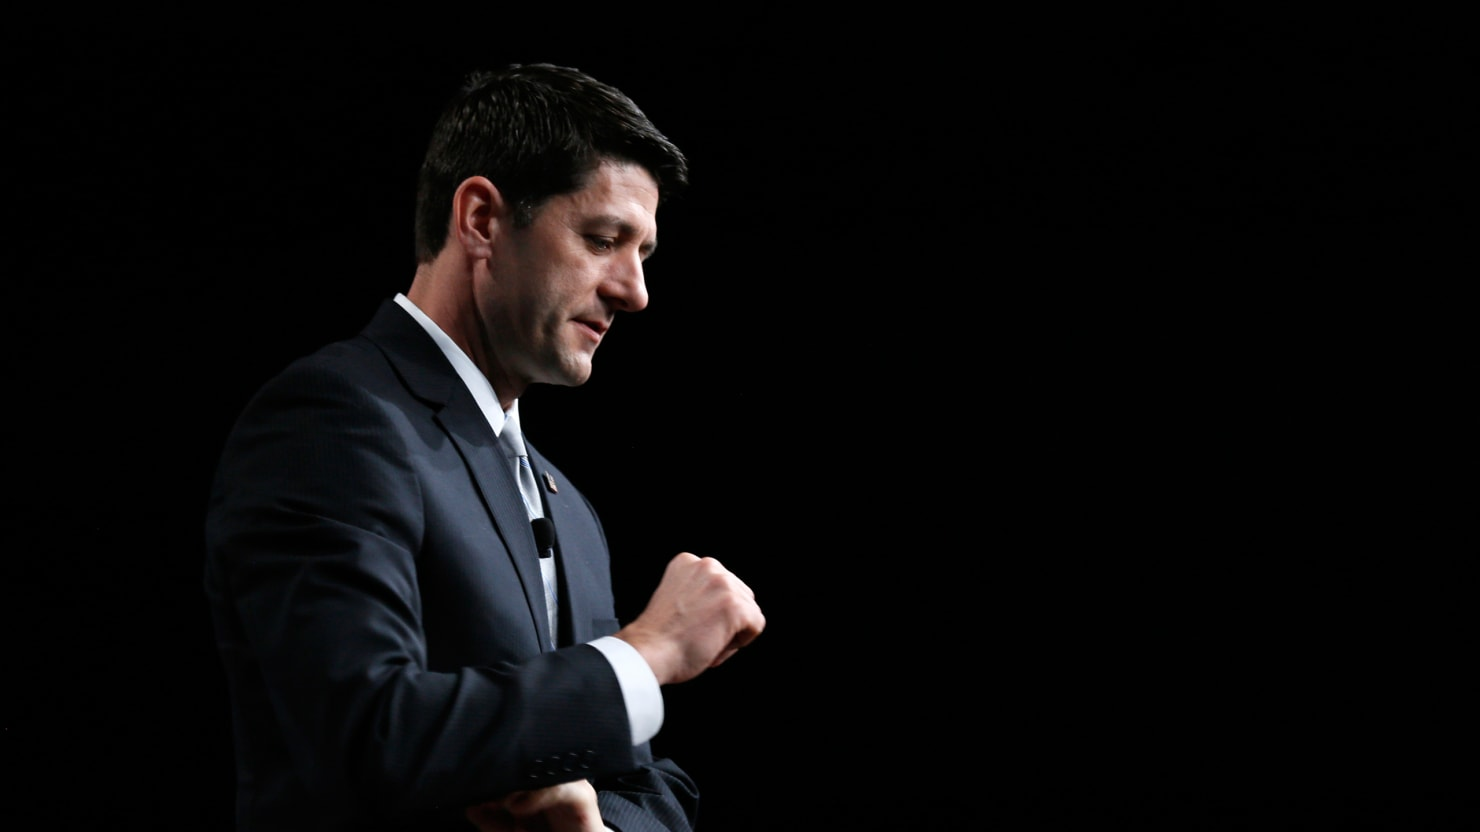 Paul Ryan's War on Poverty